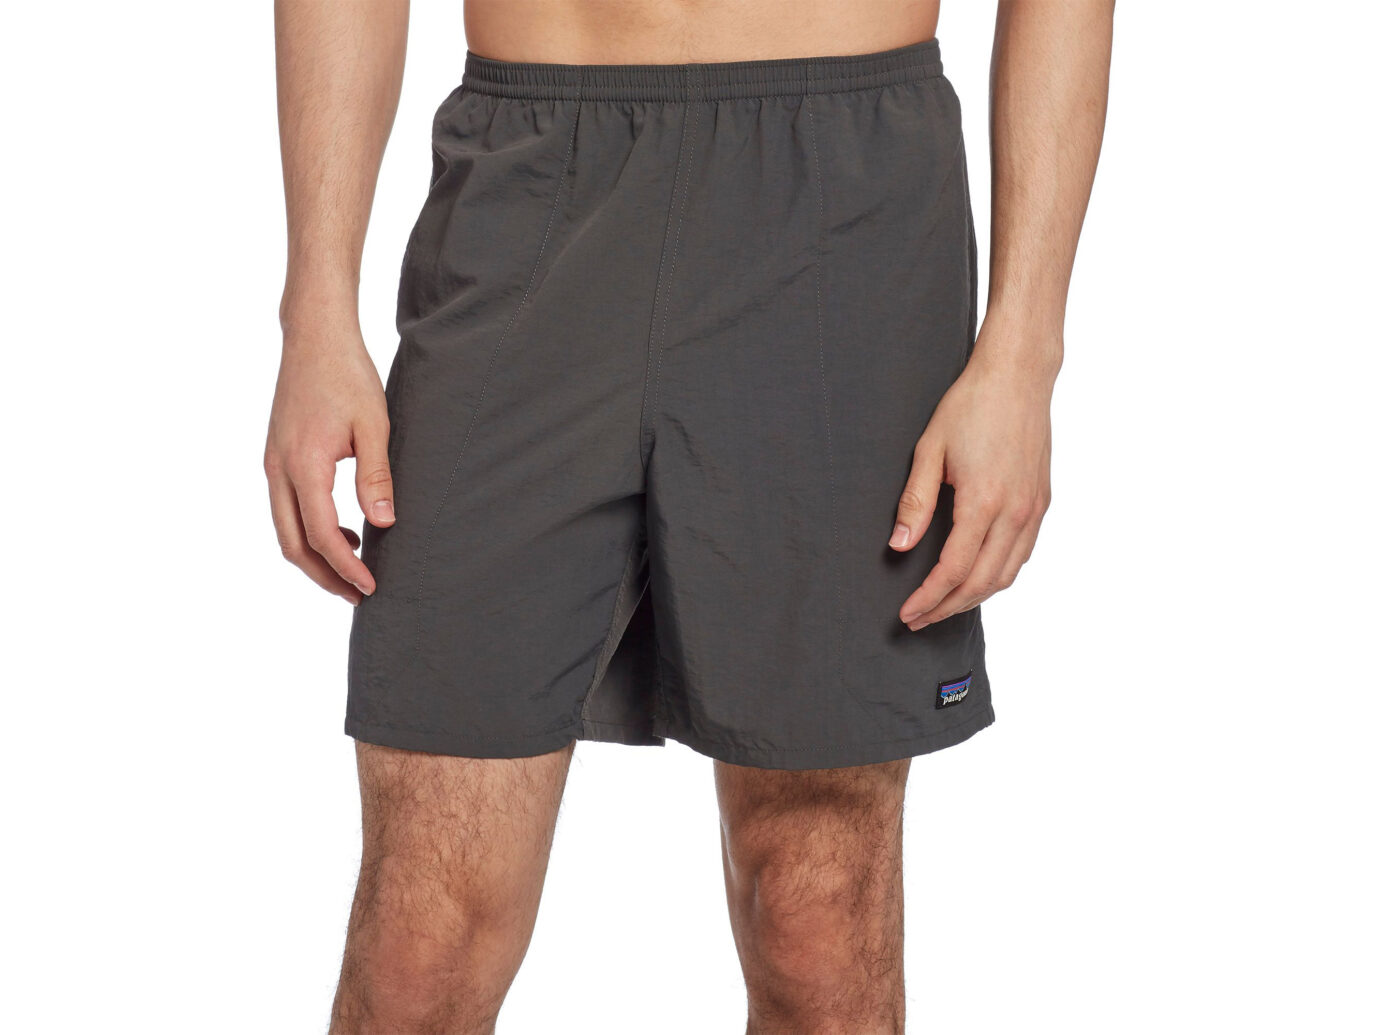 Patagonia Men's Baggies 7 Swim Shorts in Forge Grey